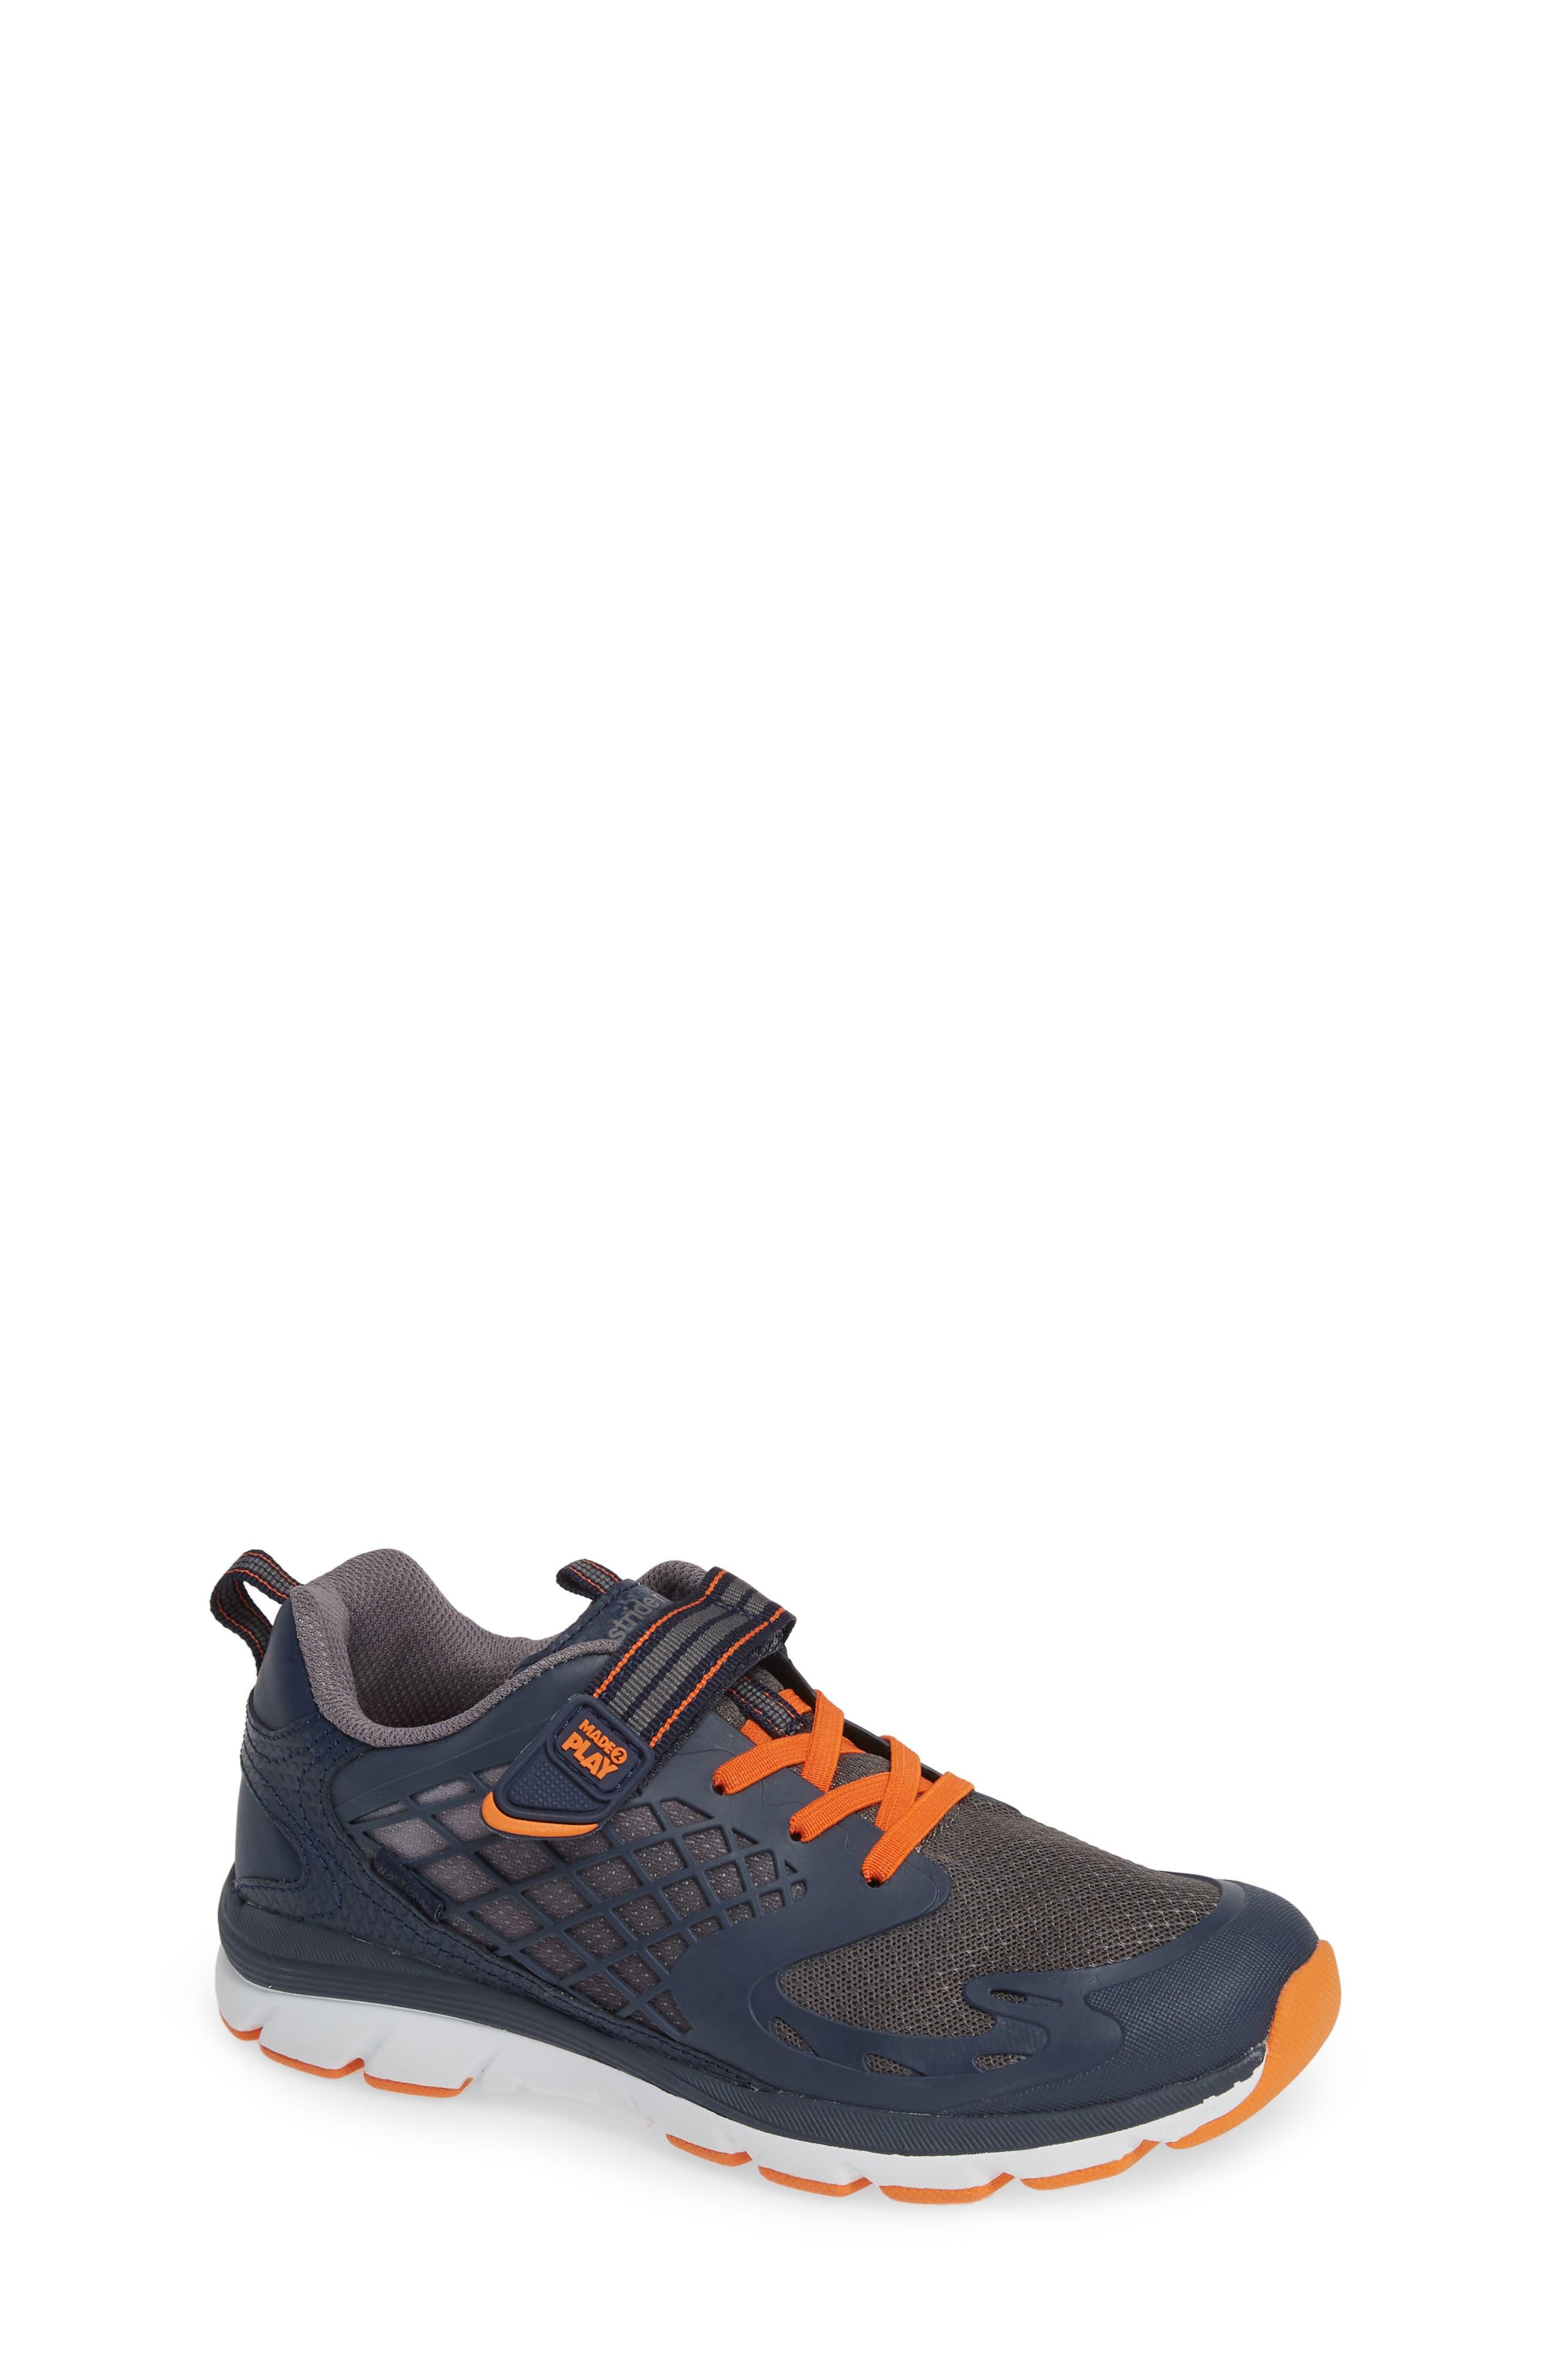 Made 2 Play Breccen Sneaker,                         Main,                         color, NAVY/ ORANGE